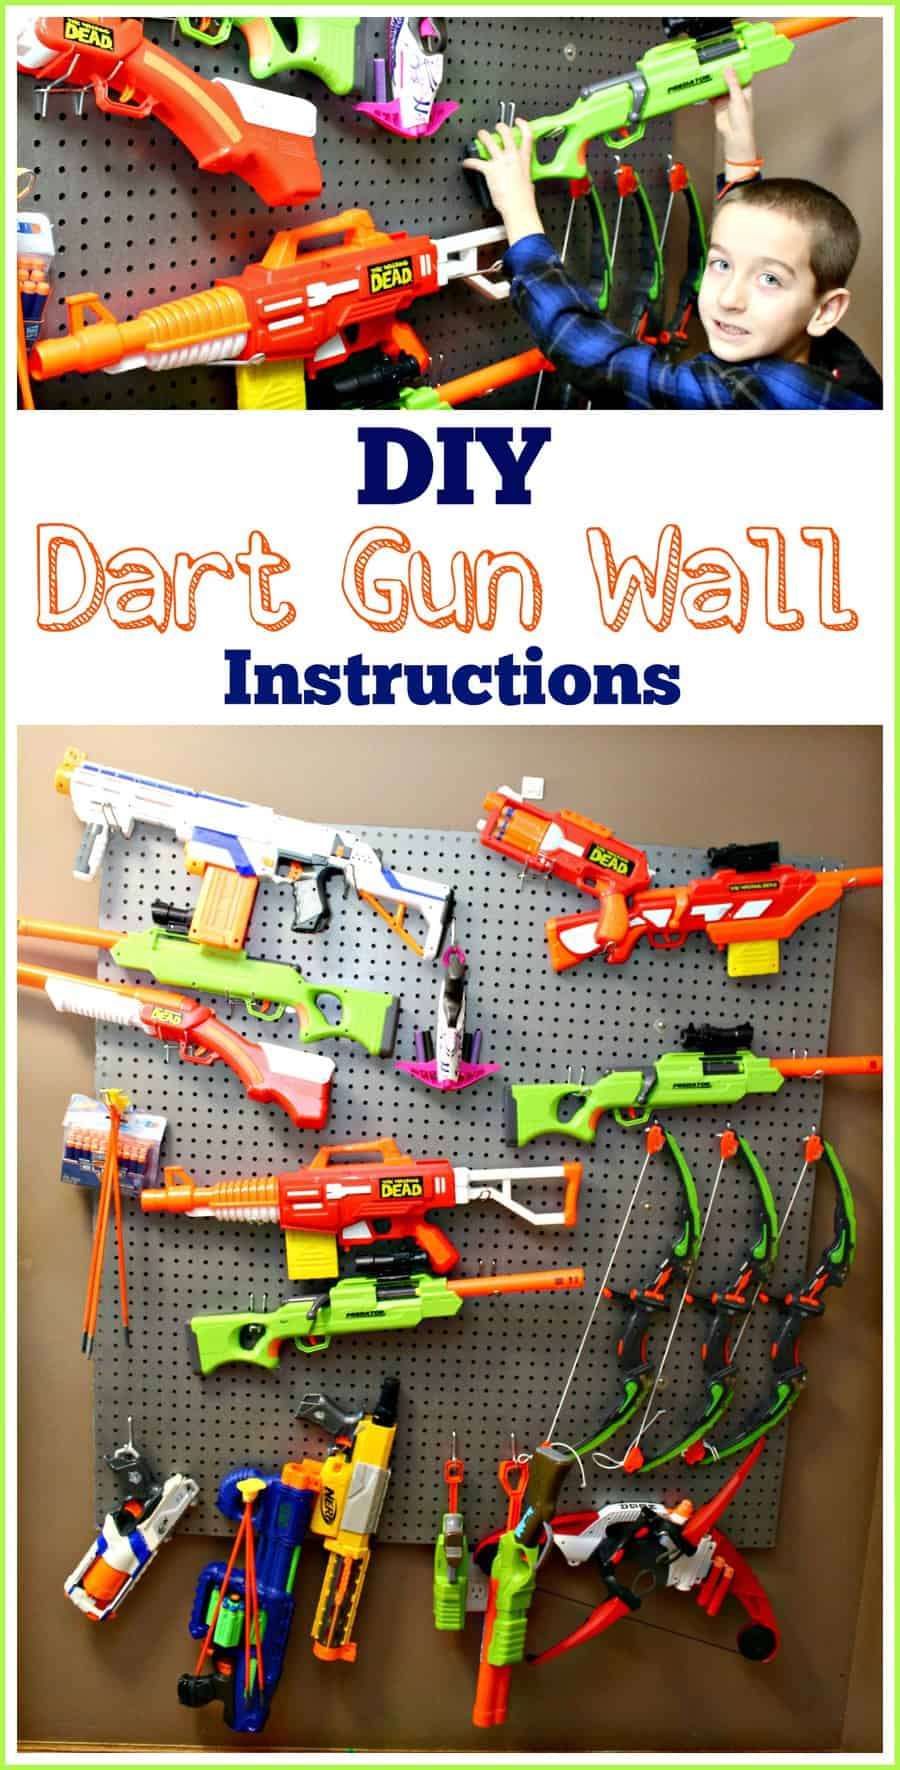 How To Built A DIY Nerf Gun Wall {Instructions}